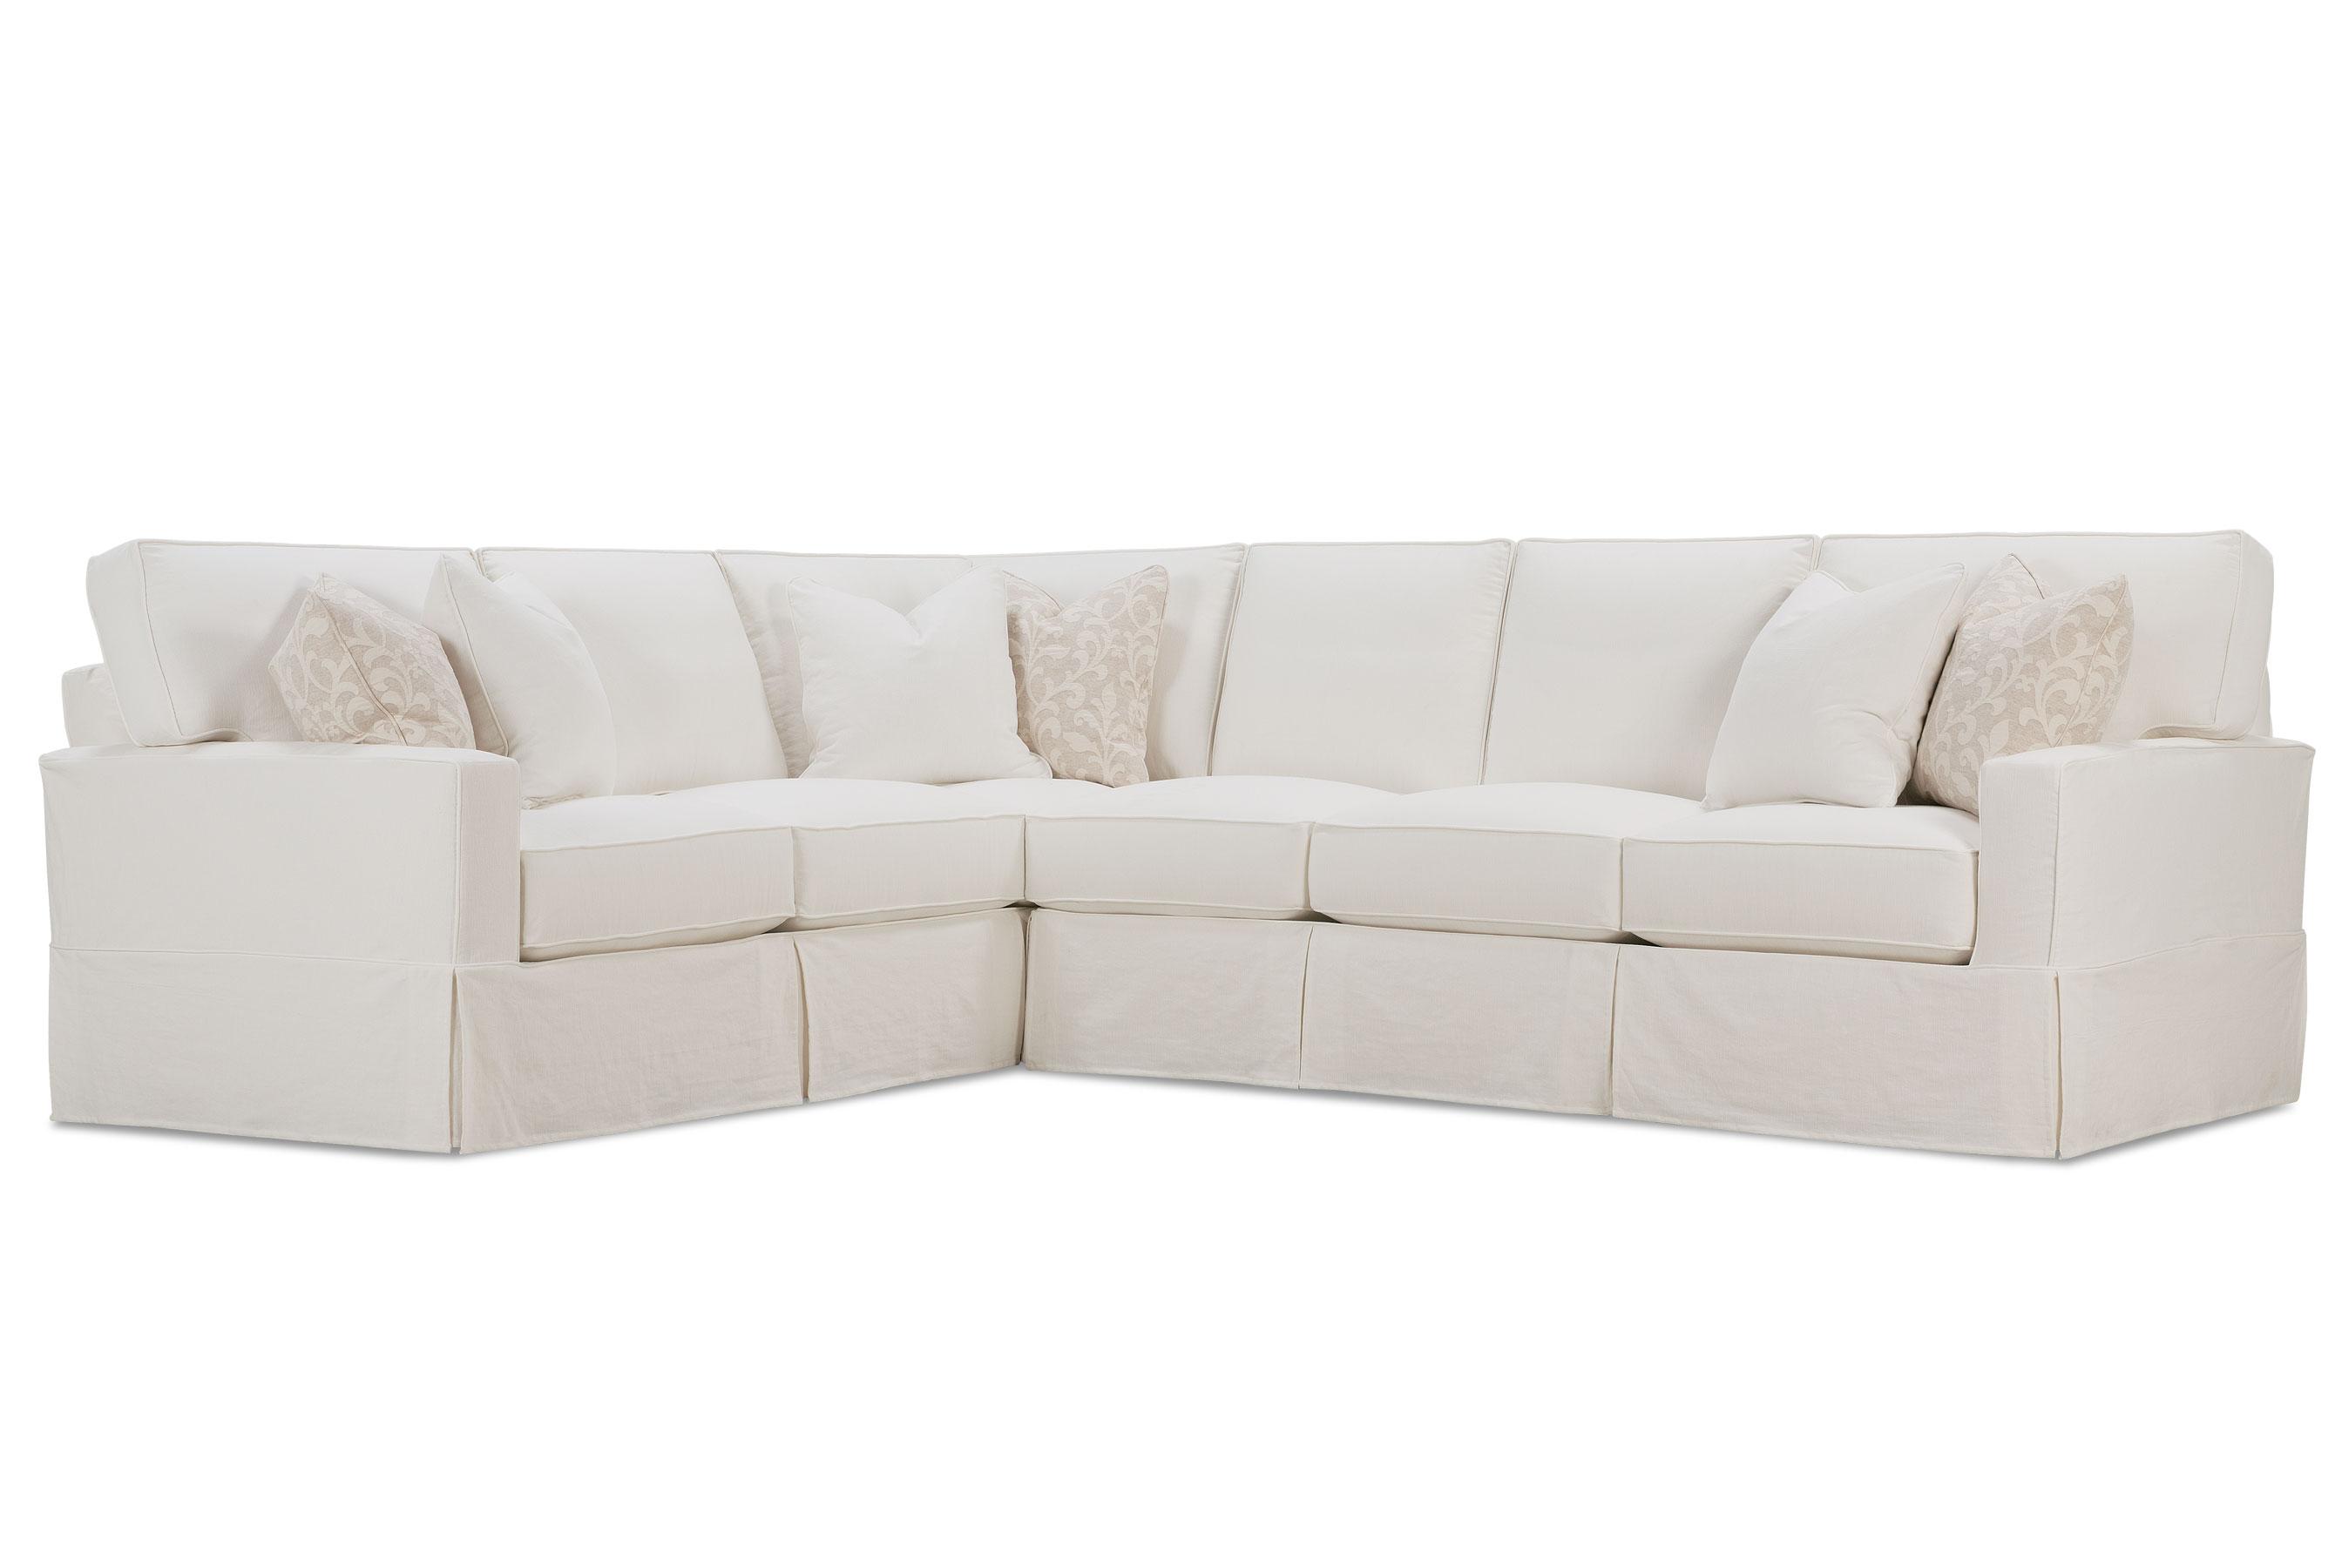 Wondrous Easton P278 Track Arm Slipcover Sectional Sofas And Sectionals Creativecarmelina Interior Chair Design Creativecarmelinacom